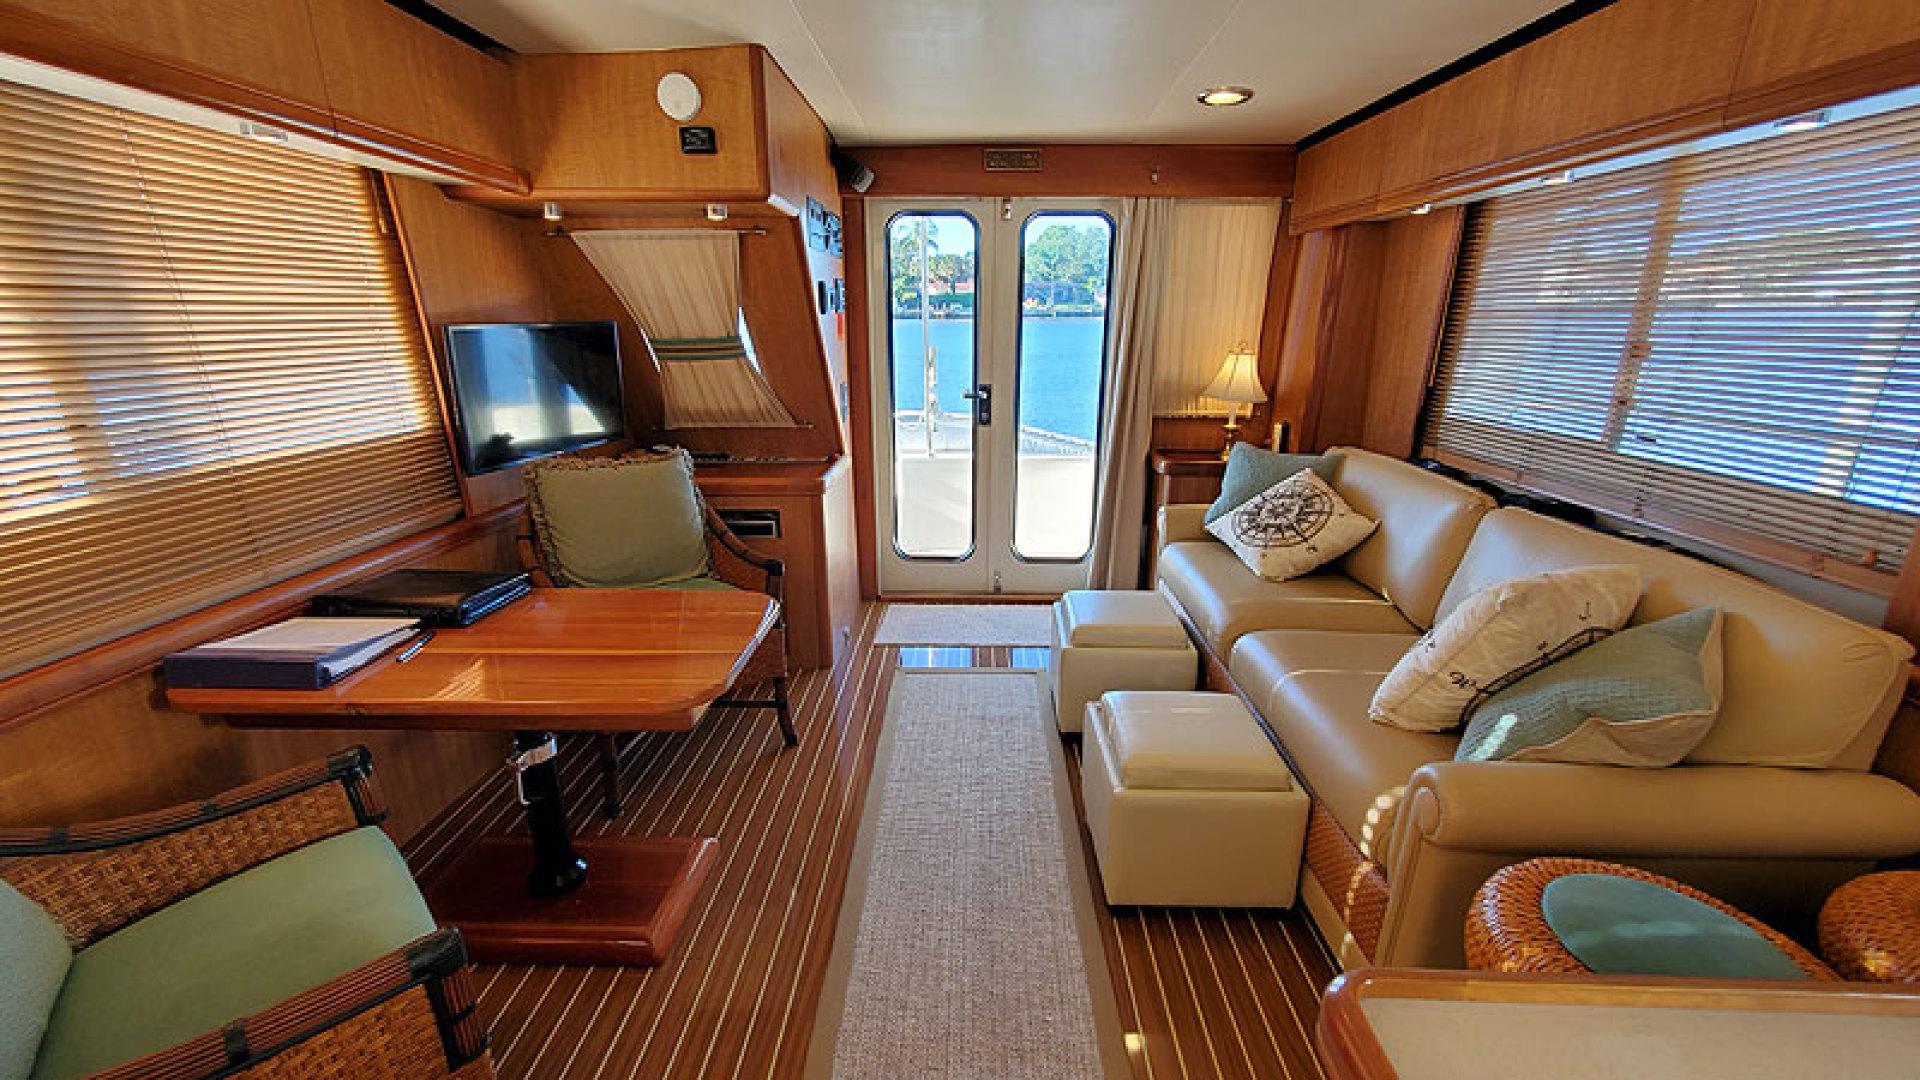 Mainship-430 Sedan 2006-Windy Cove II Venice-Florida-United States-1266378 | Thumbnail